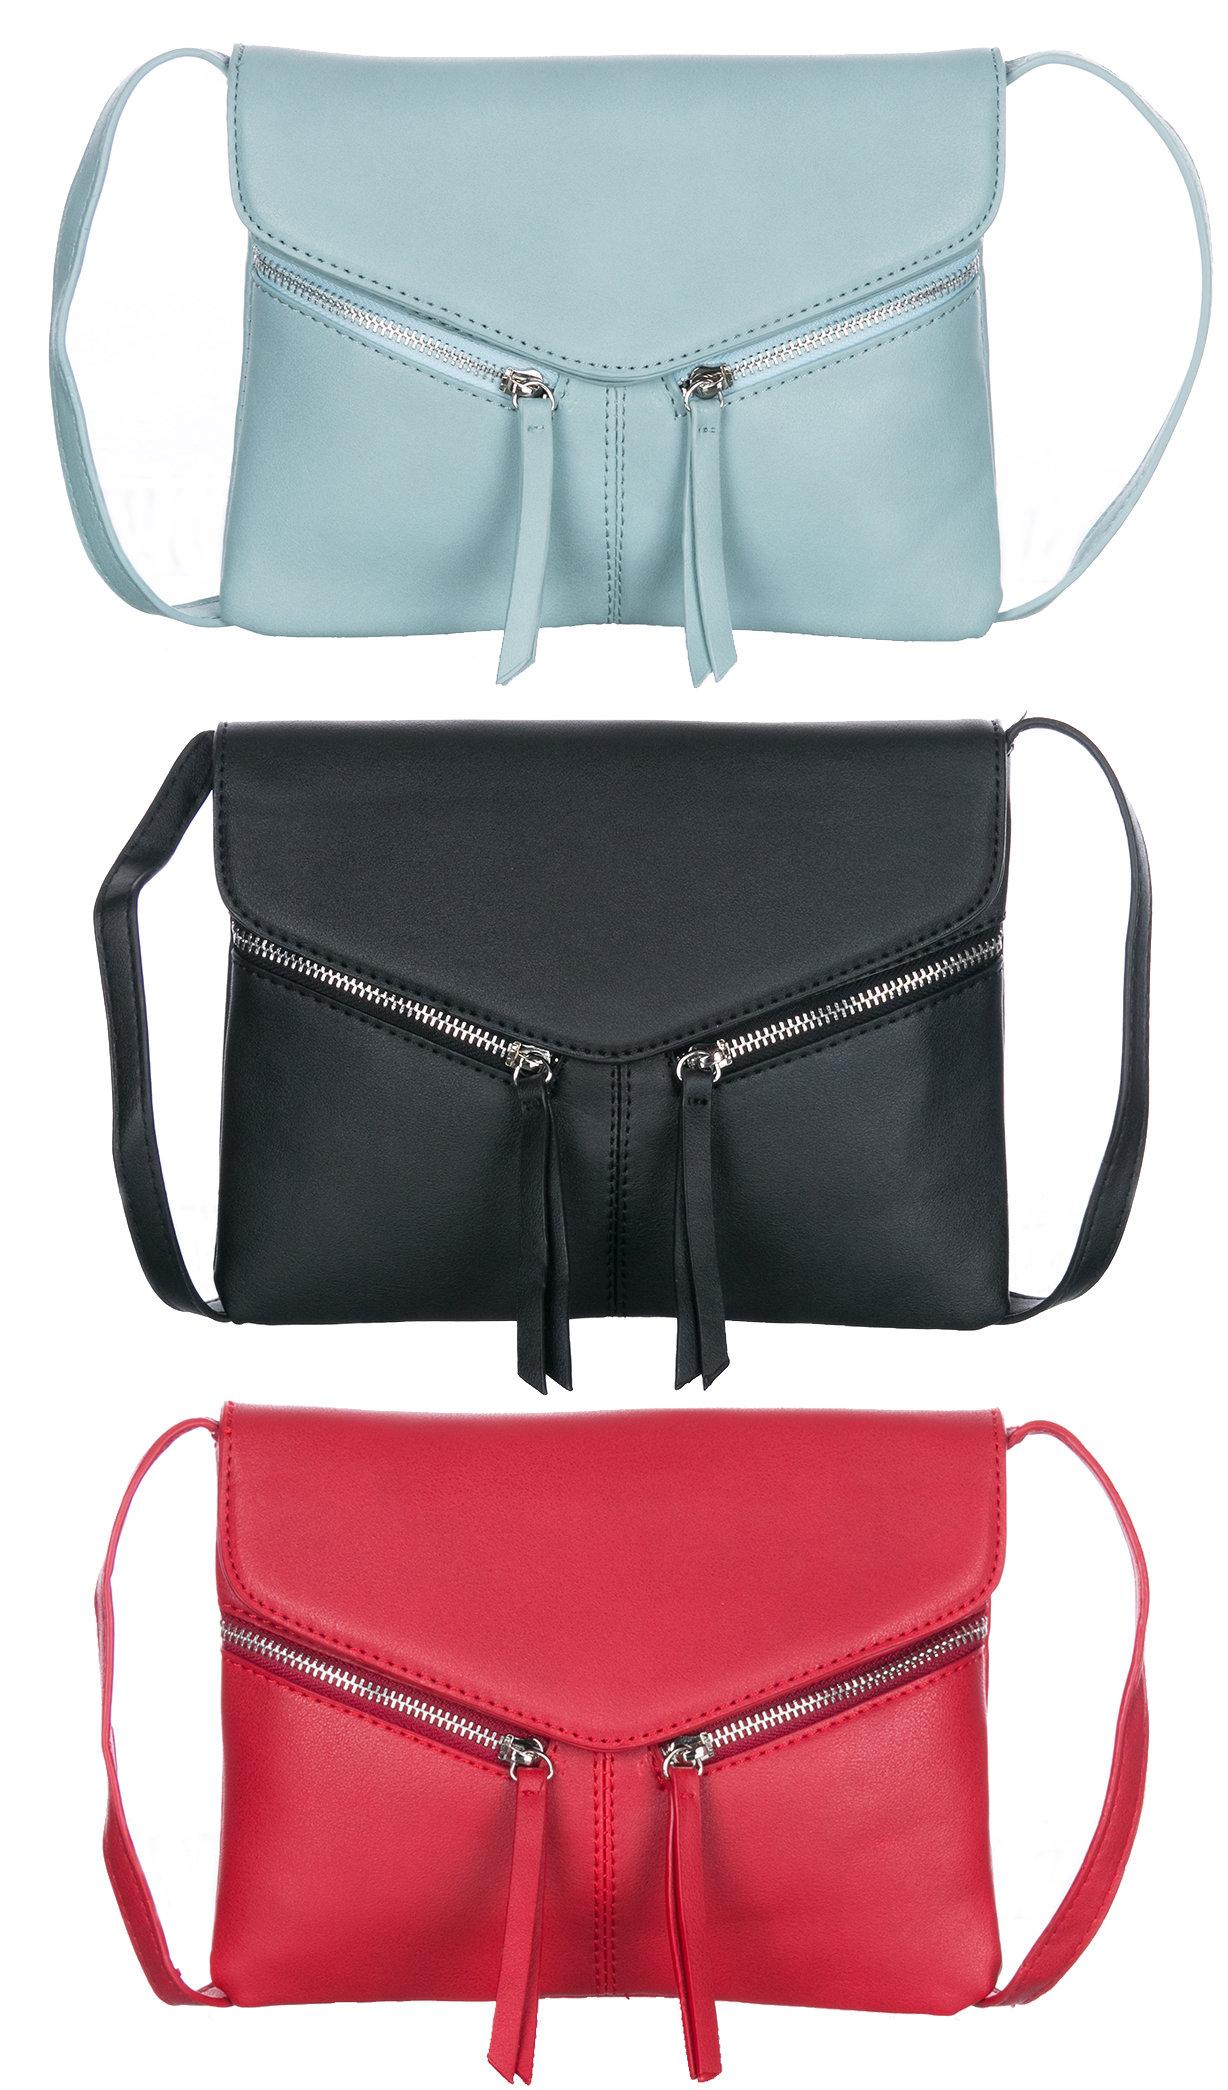 0a1da19d8aa Fashion Icon Dámská kabelka - psaníčko crossbody s zipy